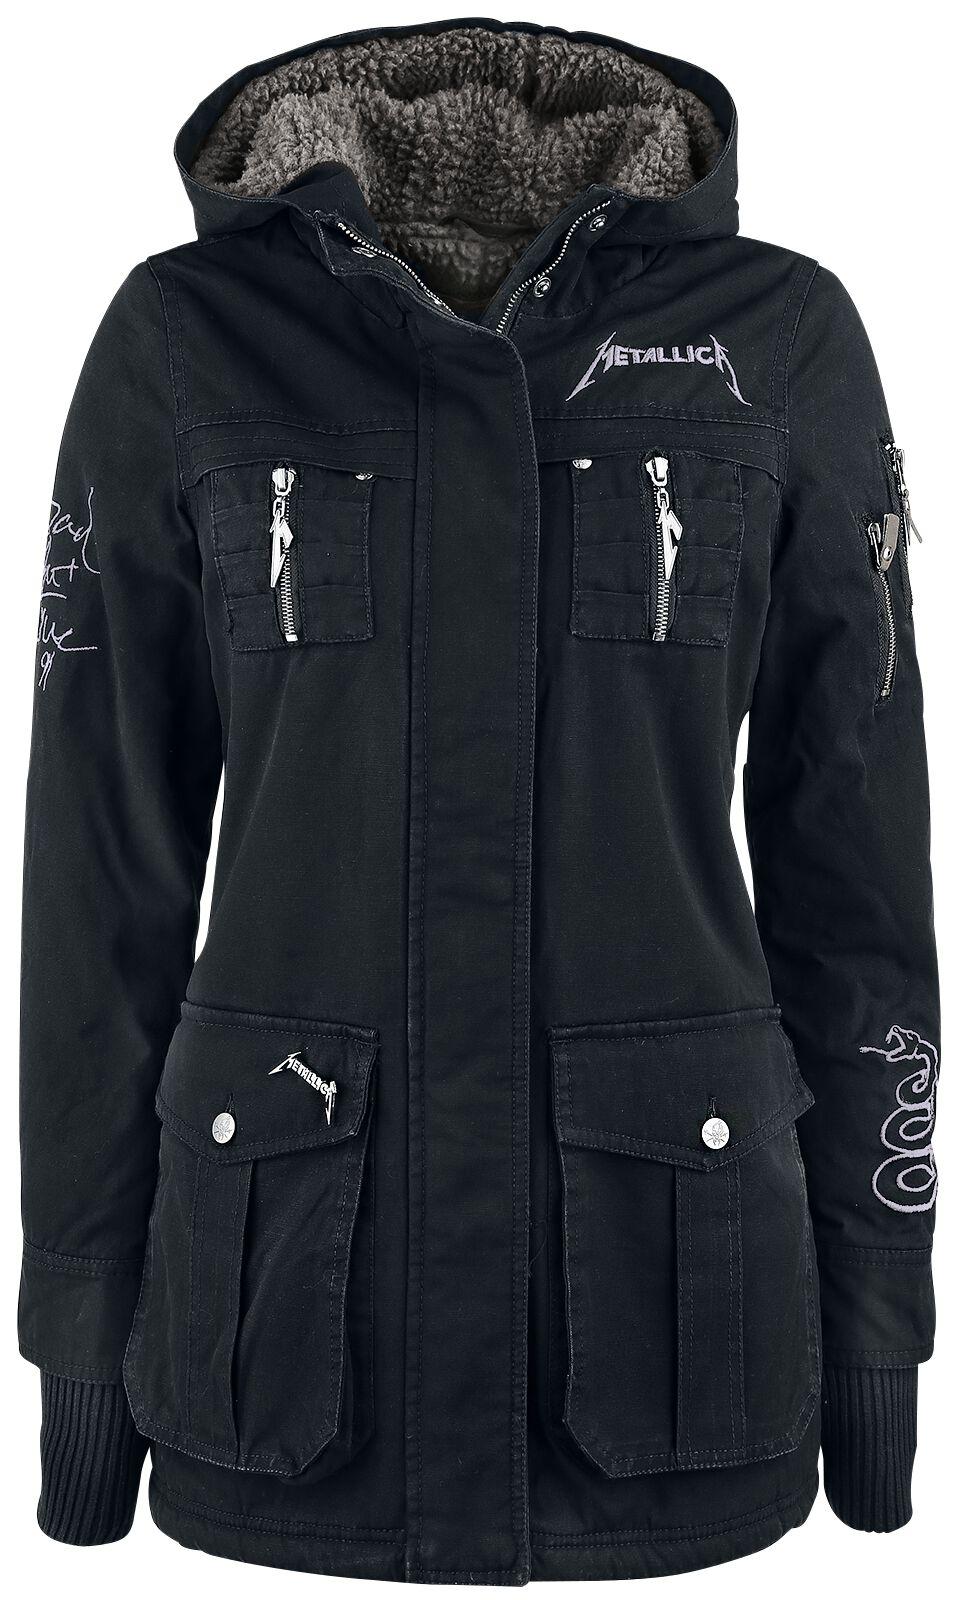 Metallica EMP Signature Collection - Frauen - schwarz